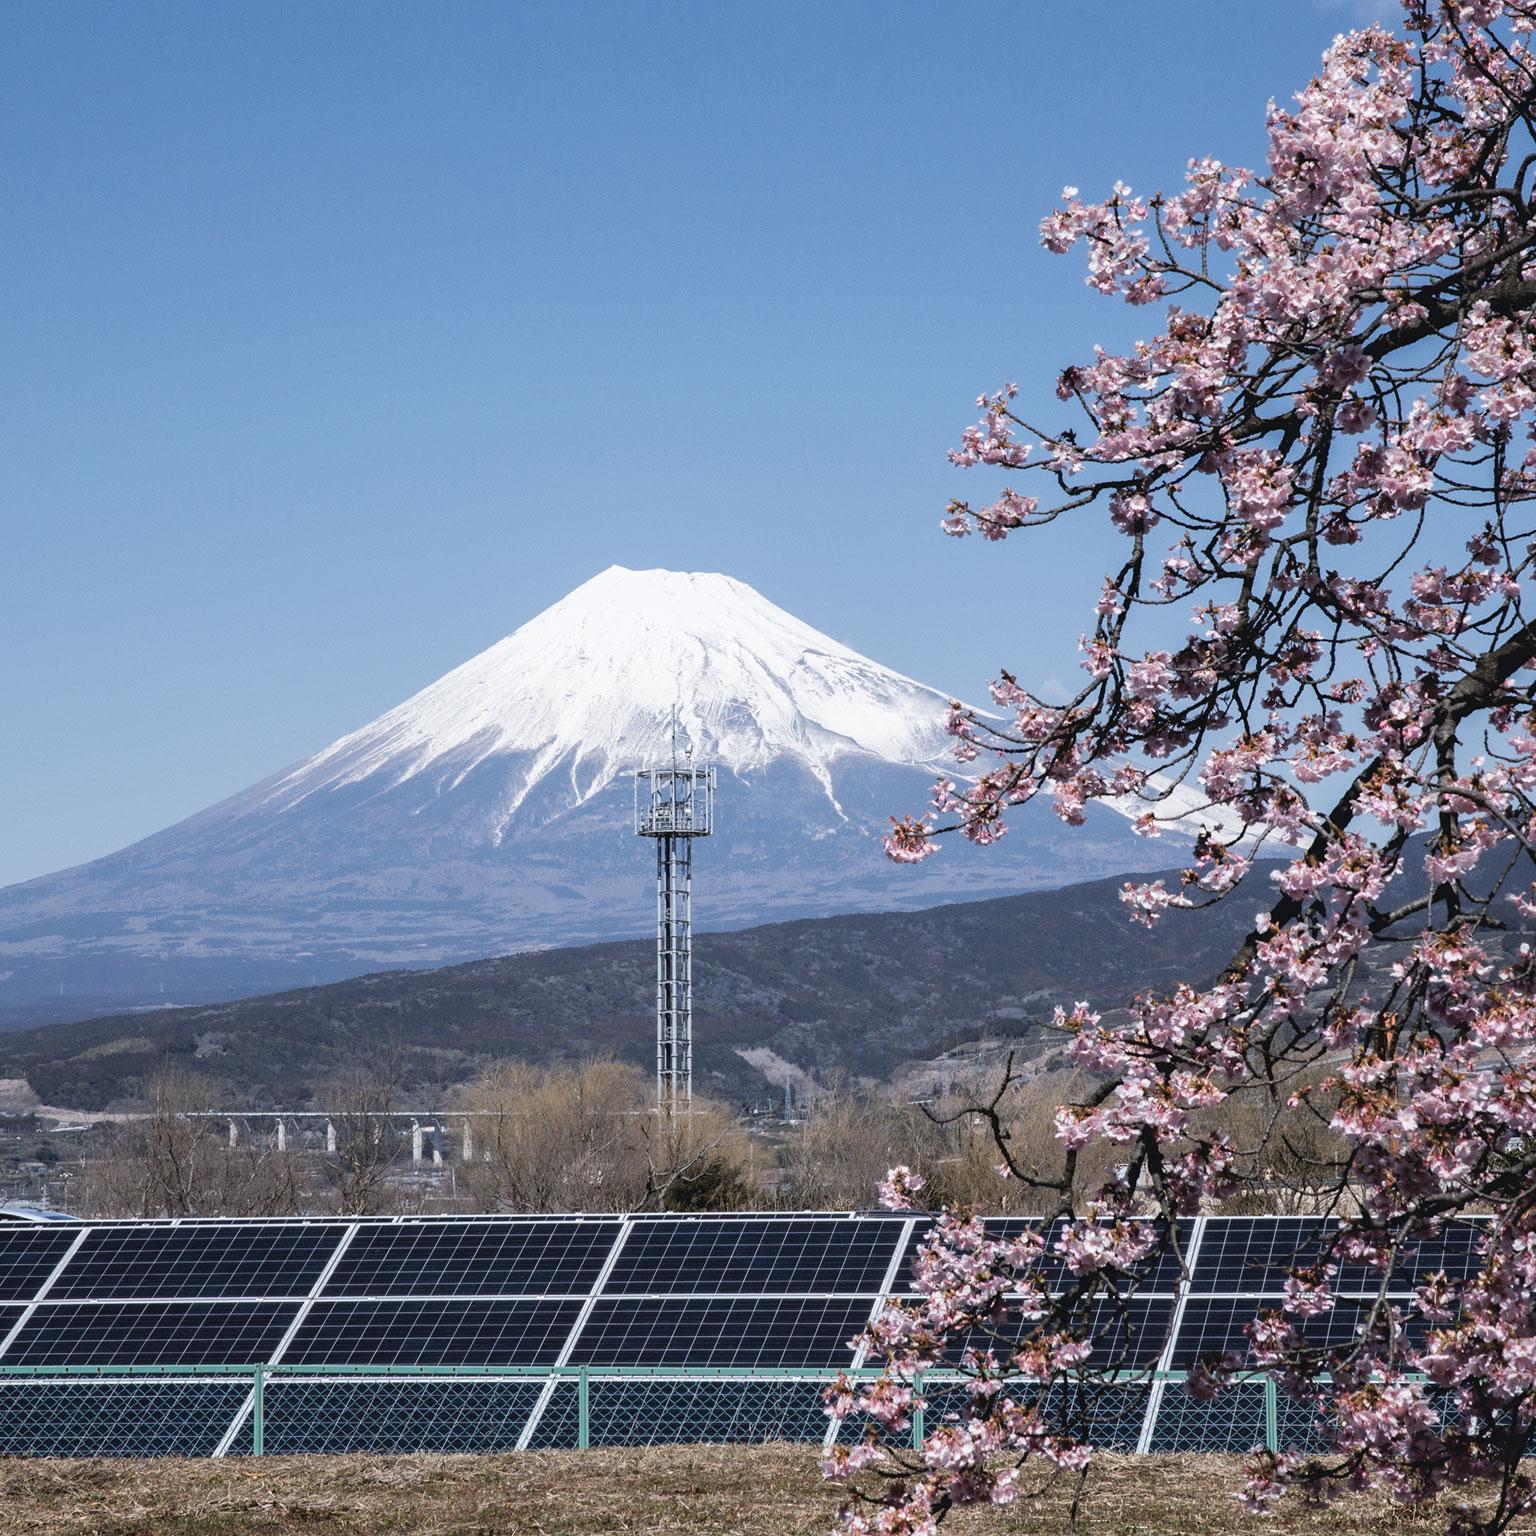 charting-a-path-from-the-shuchu-kiyaku-to-esg-for-japanese-companies